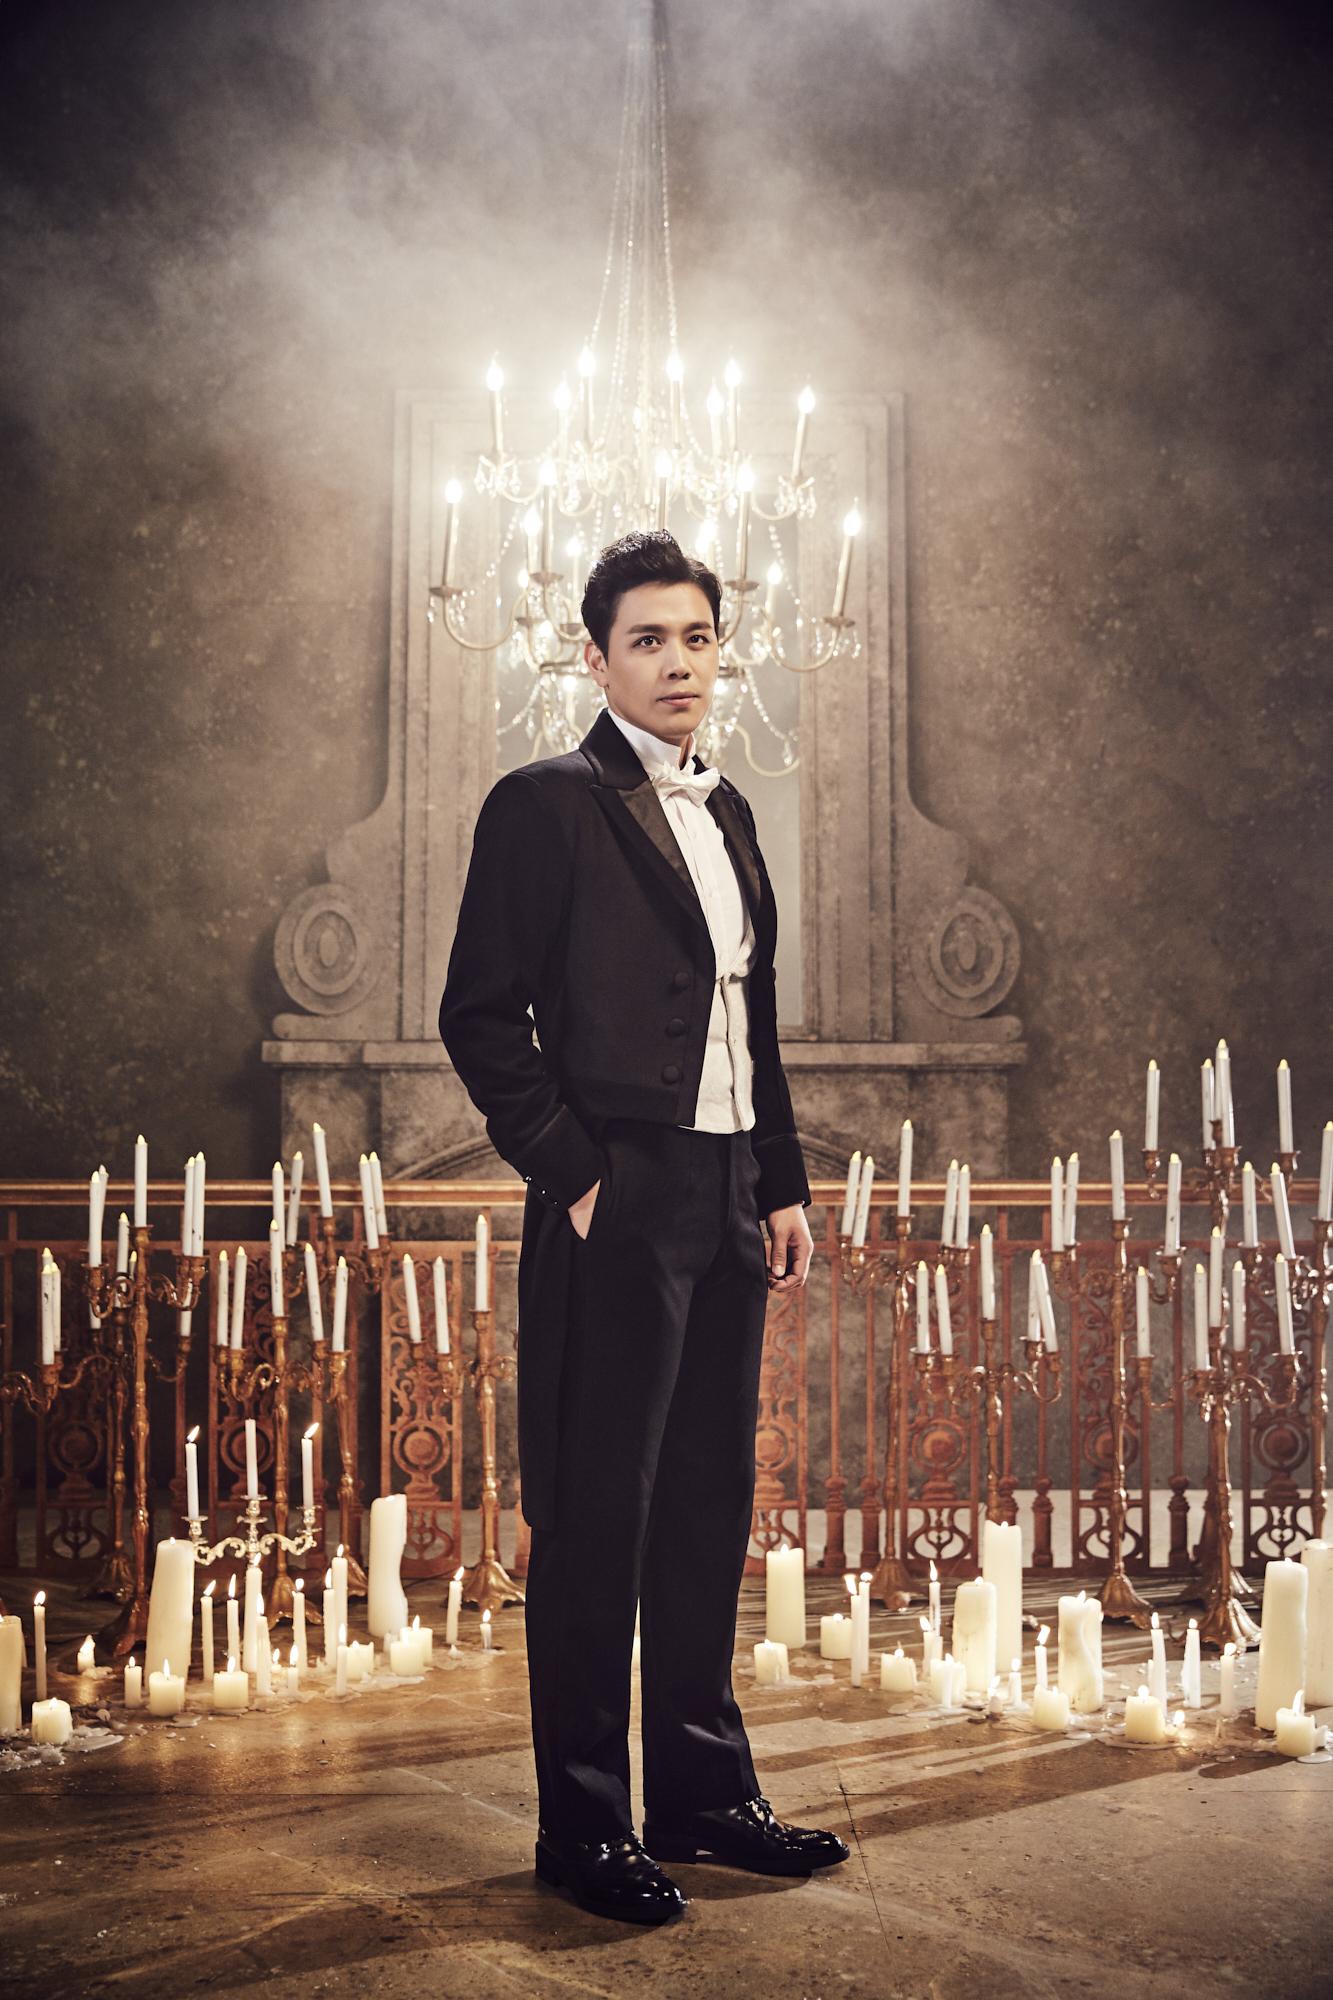 Son Joon Ho